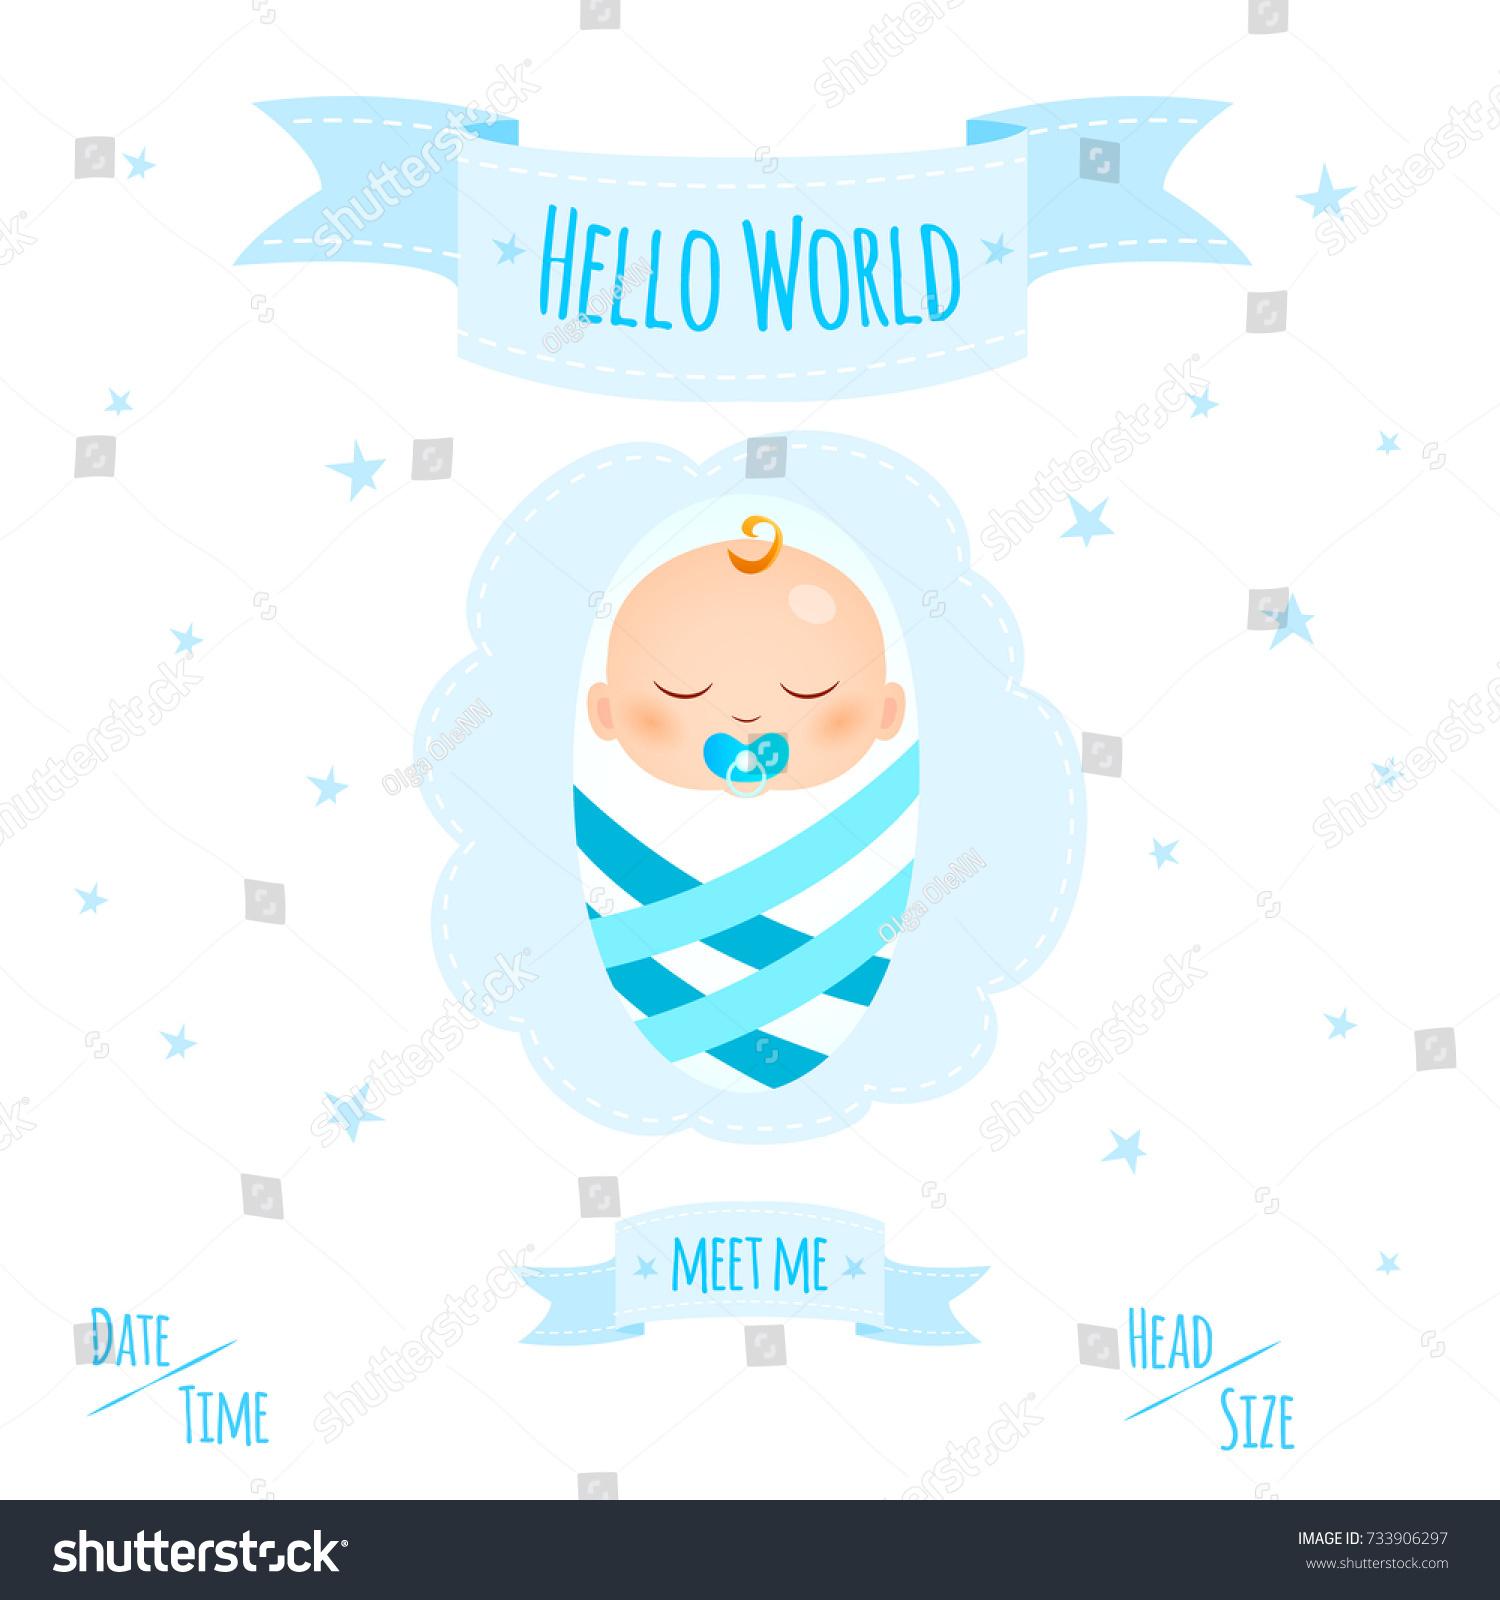 New child born baby newborn greeting stock vector 733906297 new child born baby newborn greeting card with girl kid in diapers words hello world kristyandbryce Gallery